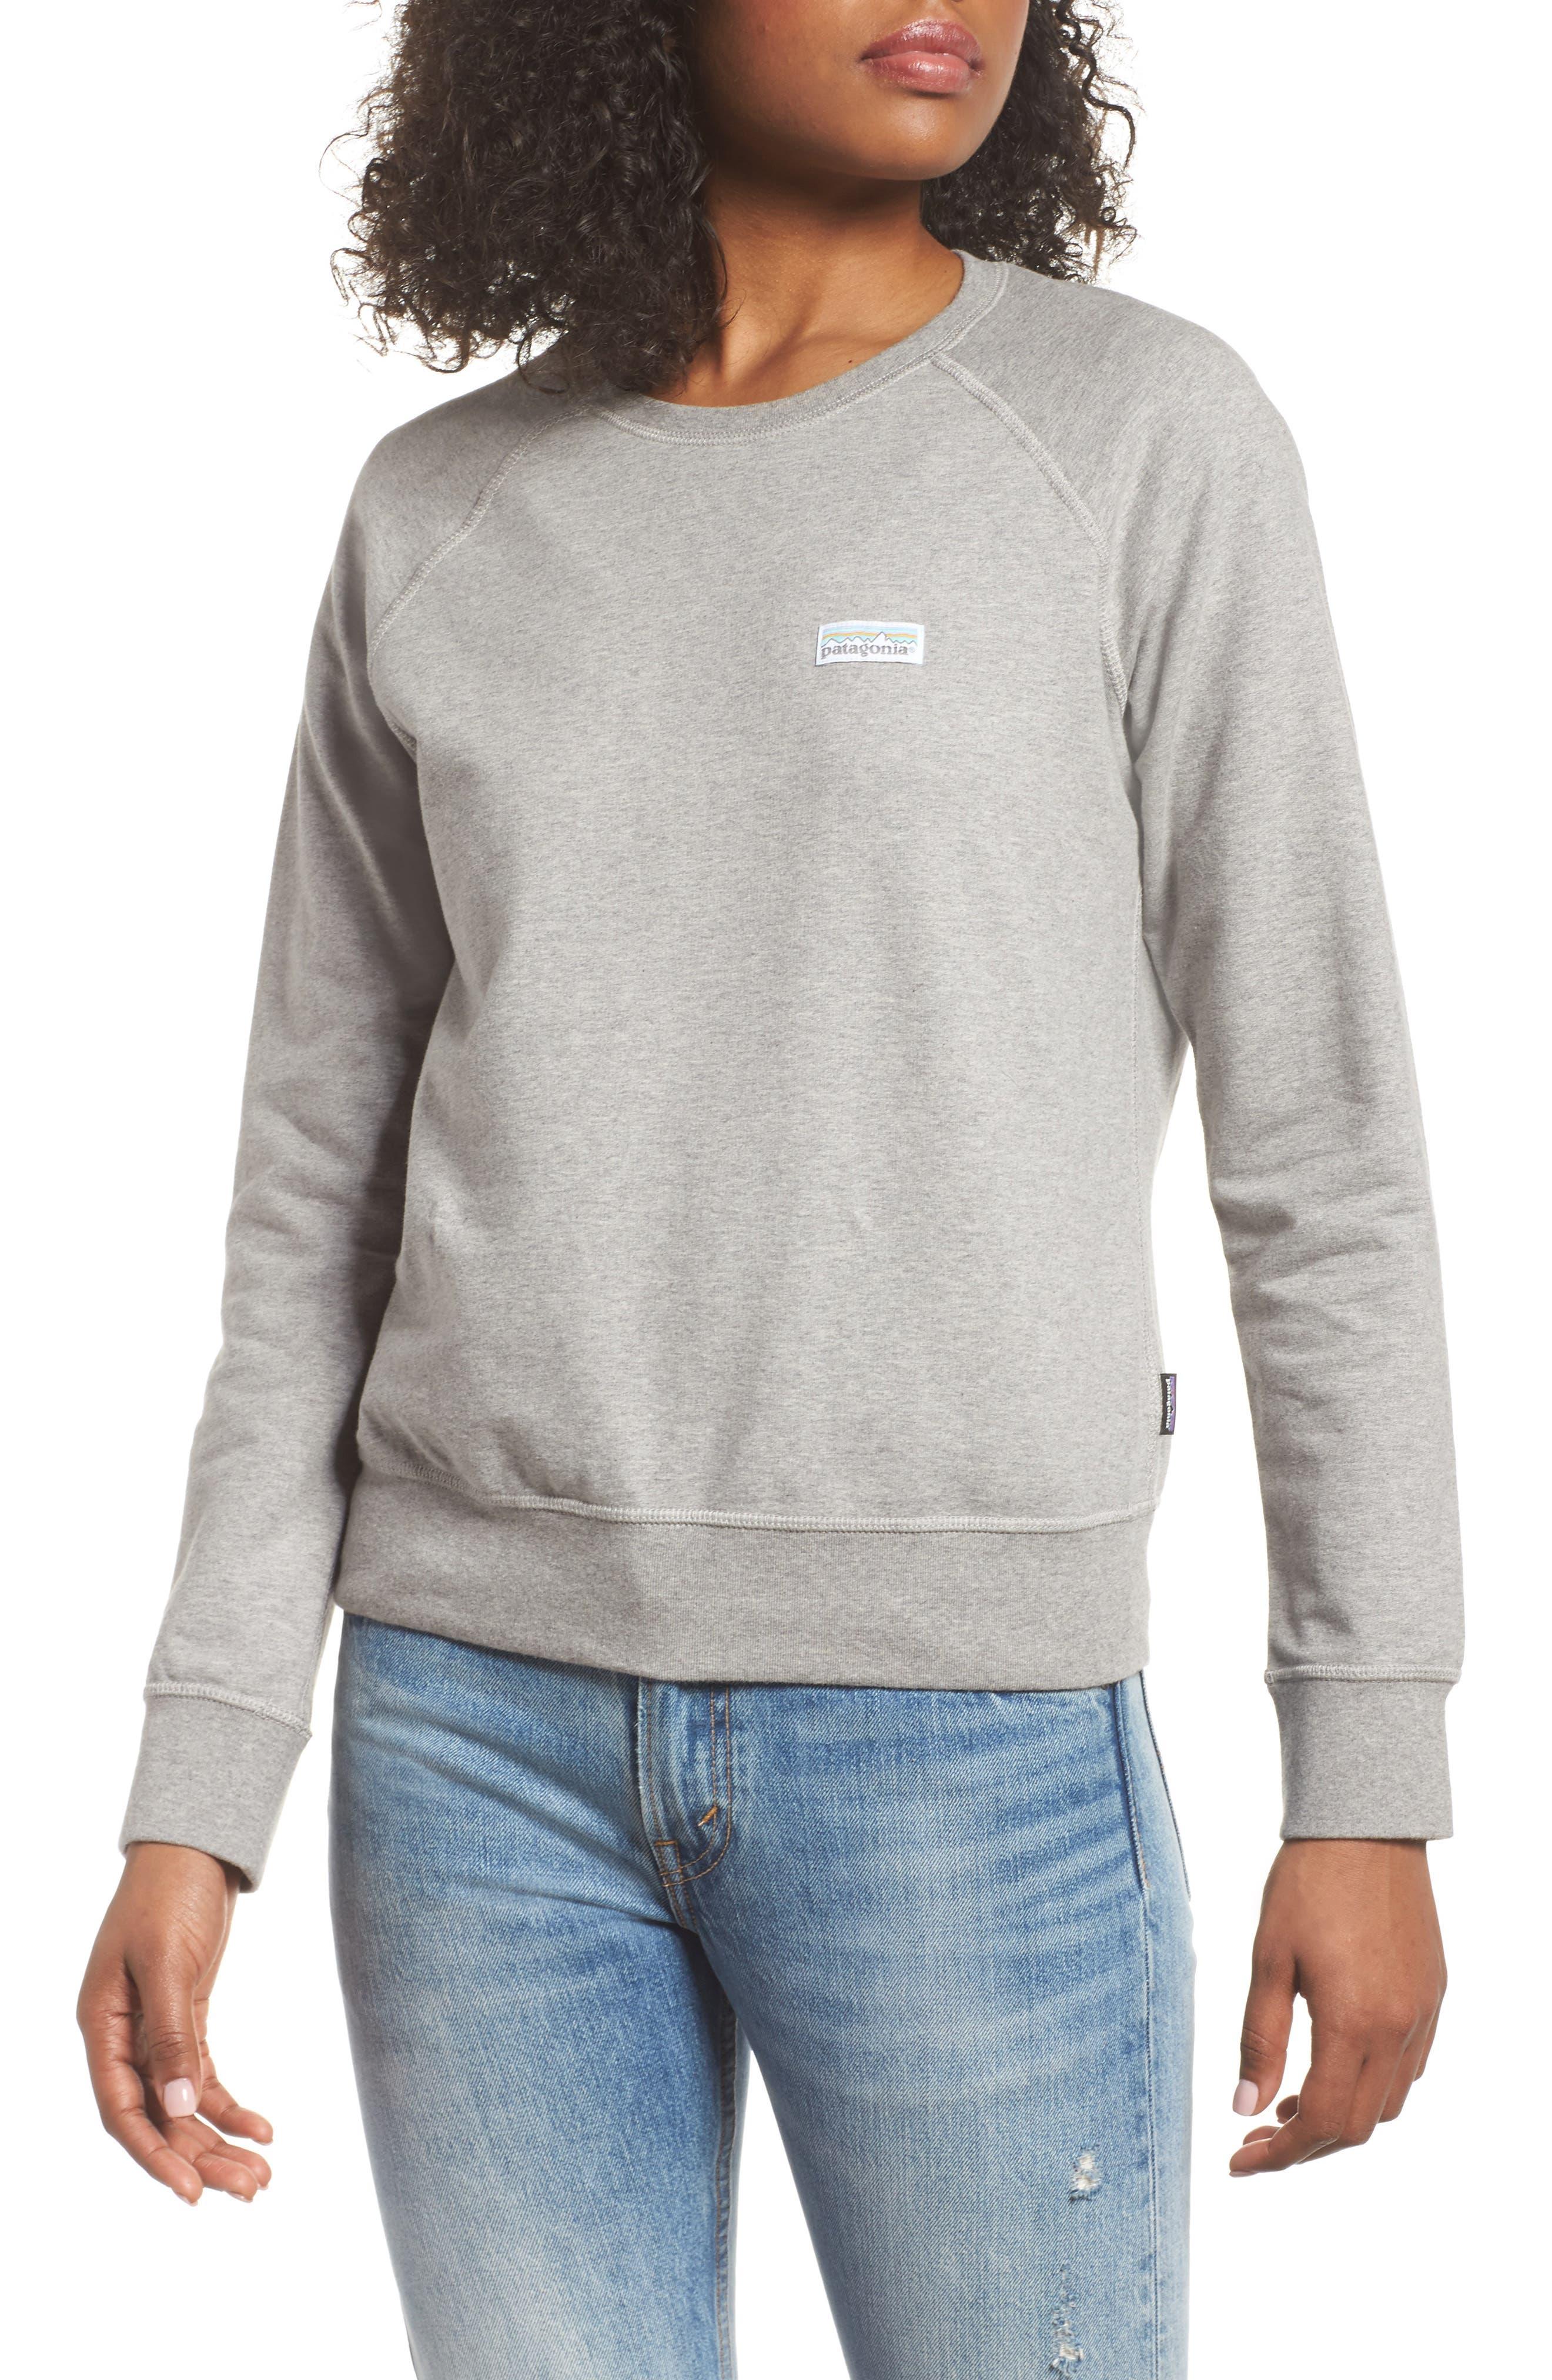 Pastel P-6 Label Midweight Sweatshirt,                             Main thumbnail 1, color,                             020